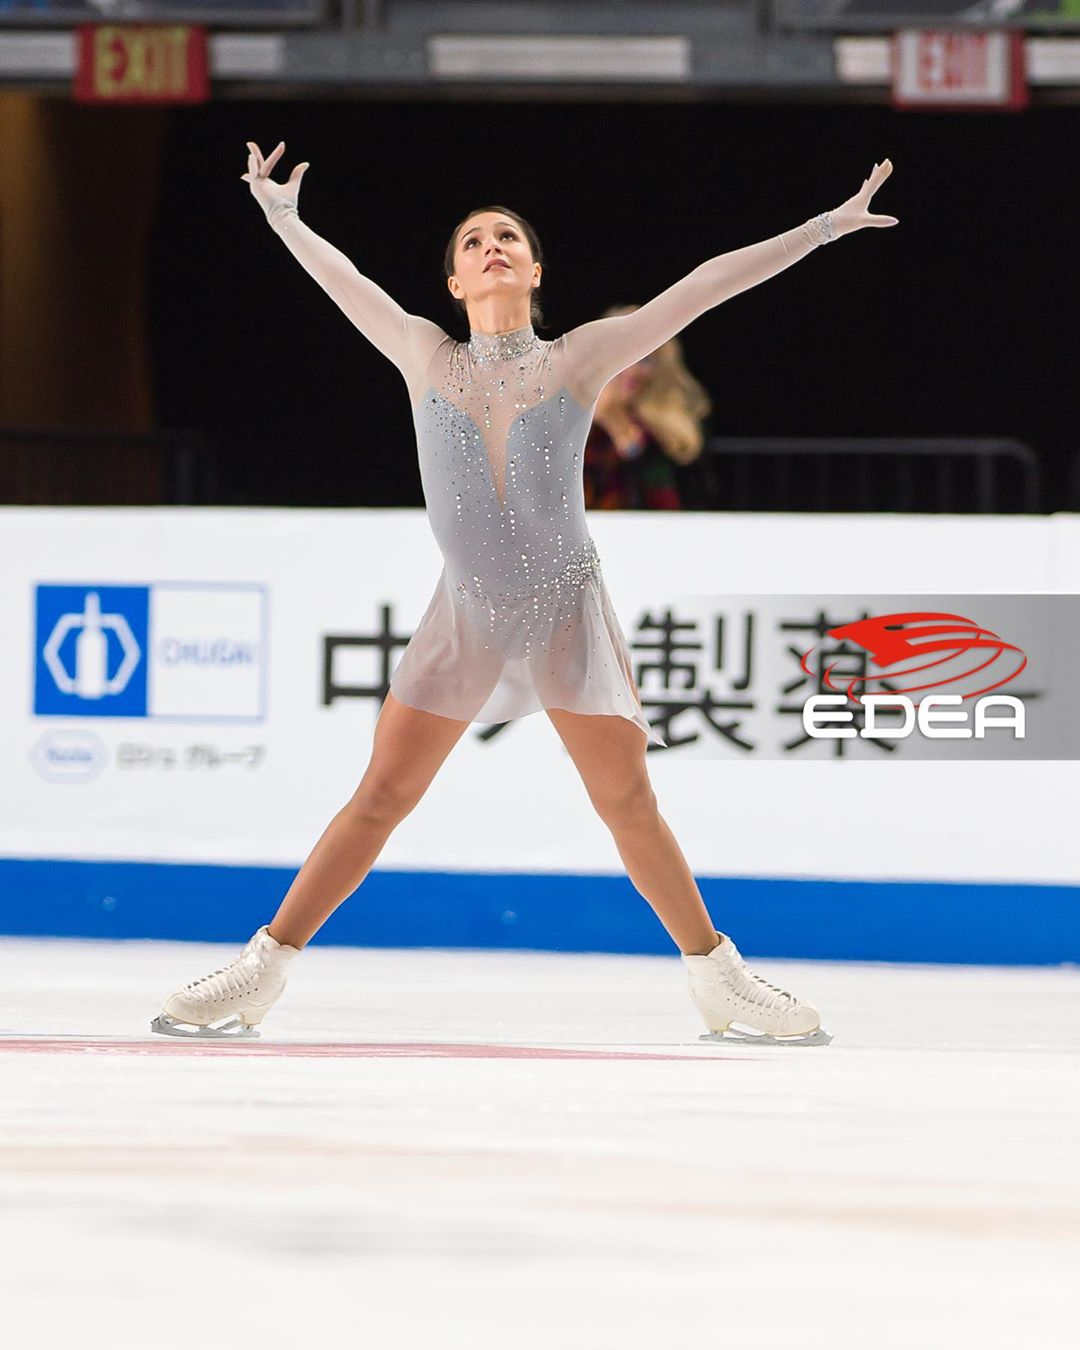 GP - 1 этап. Skate America Las Vegas, NV / USA October 18-20, 2019   - Страница 20 8HgeqC2WODc